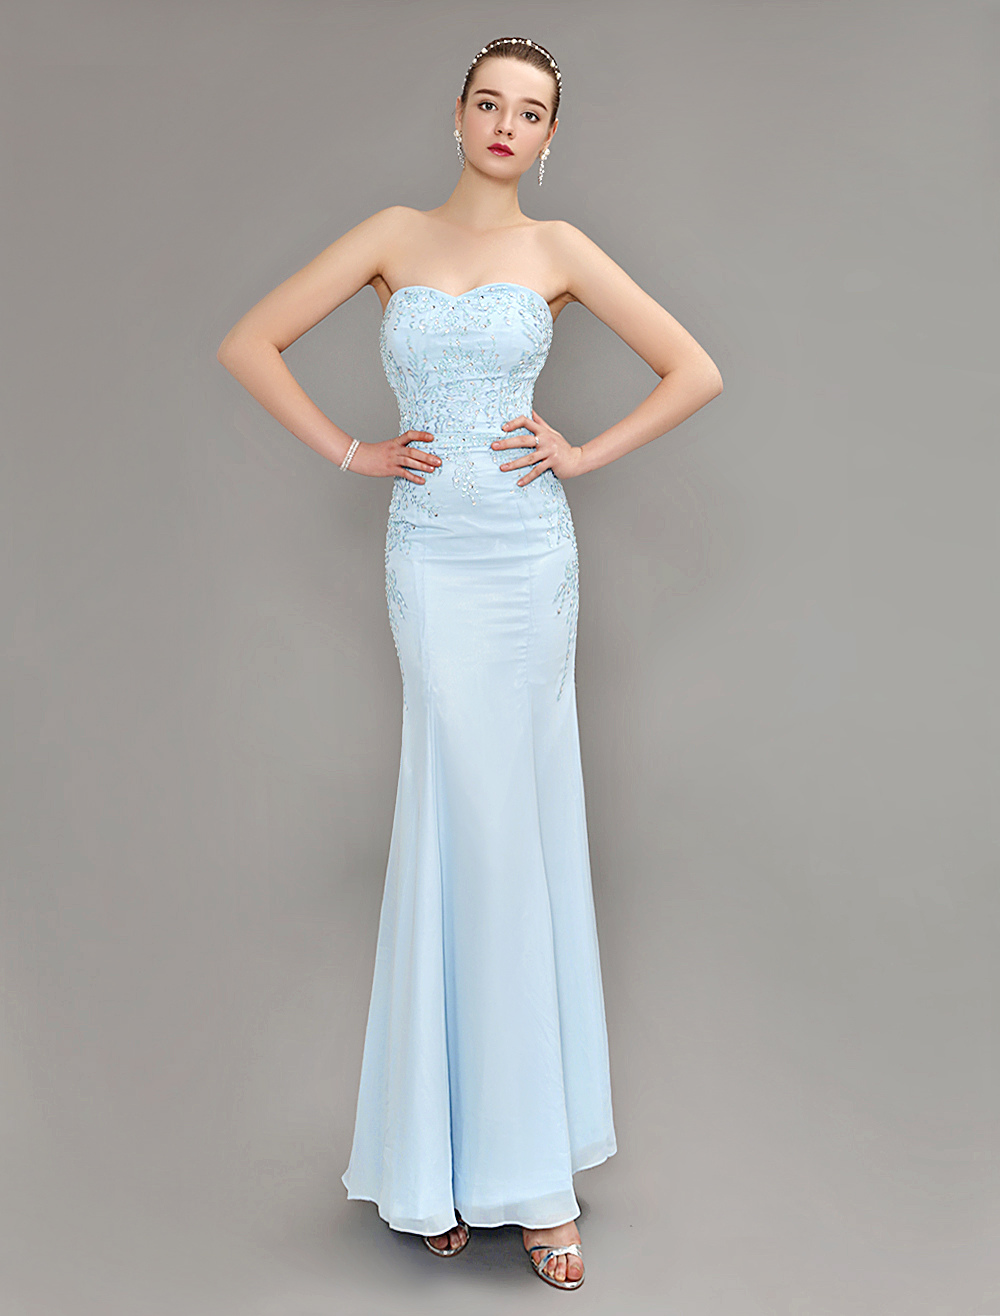 Mermaid Evening Dress Pastel Blue Strapless Party Dress Beaded Floor Length Chiffon Prom Dress (Wedding Evening Dresses) photo